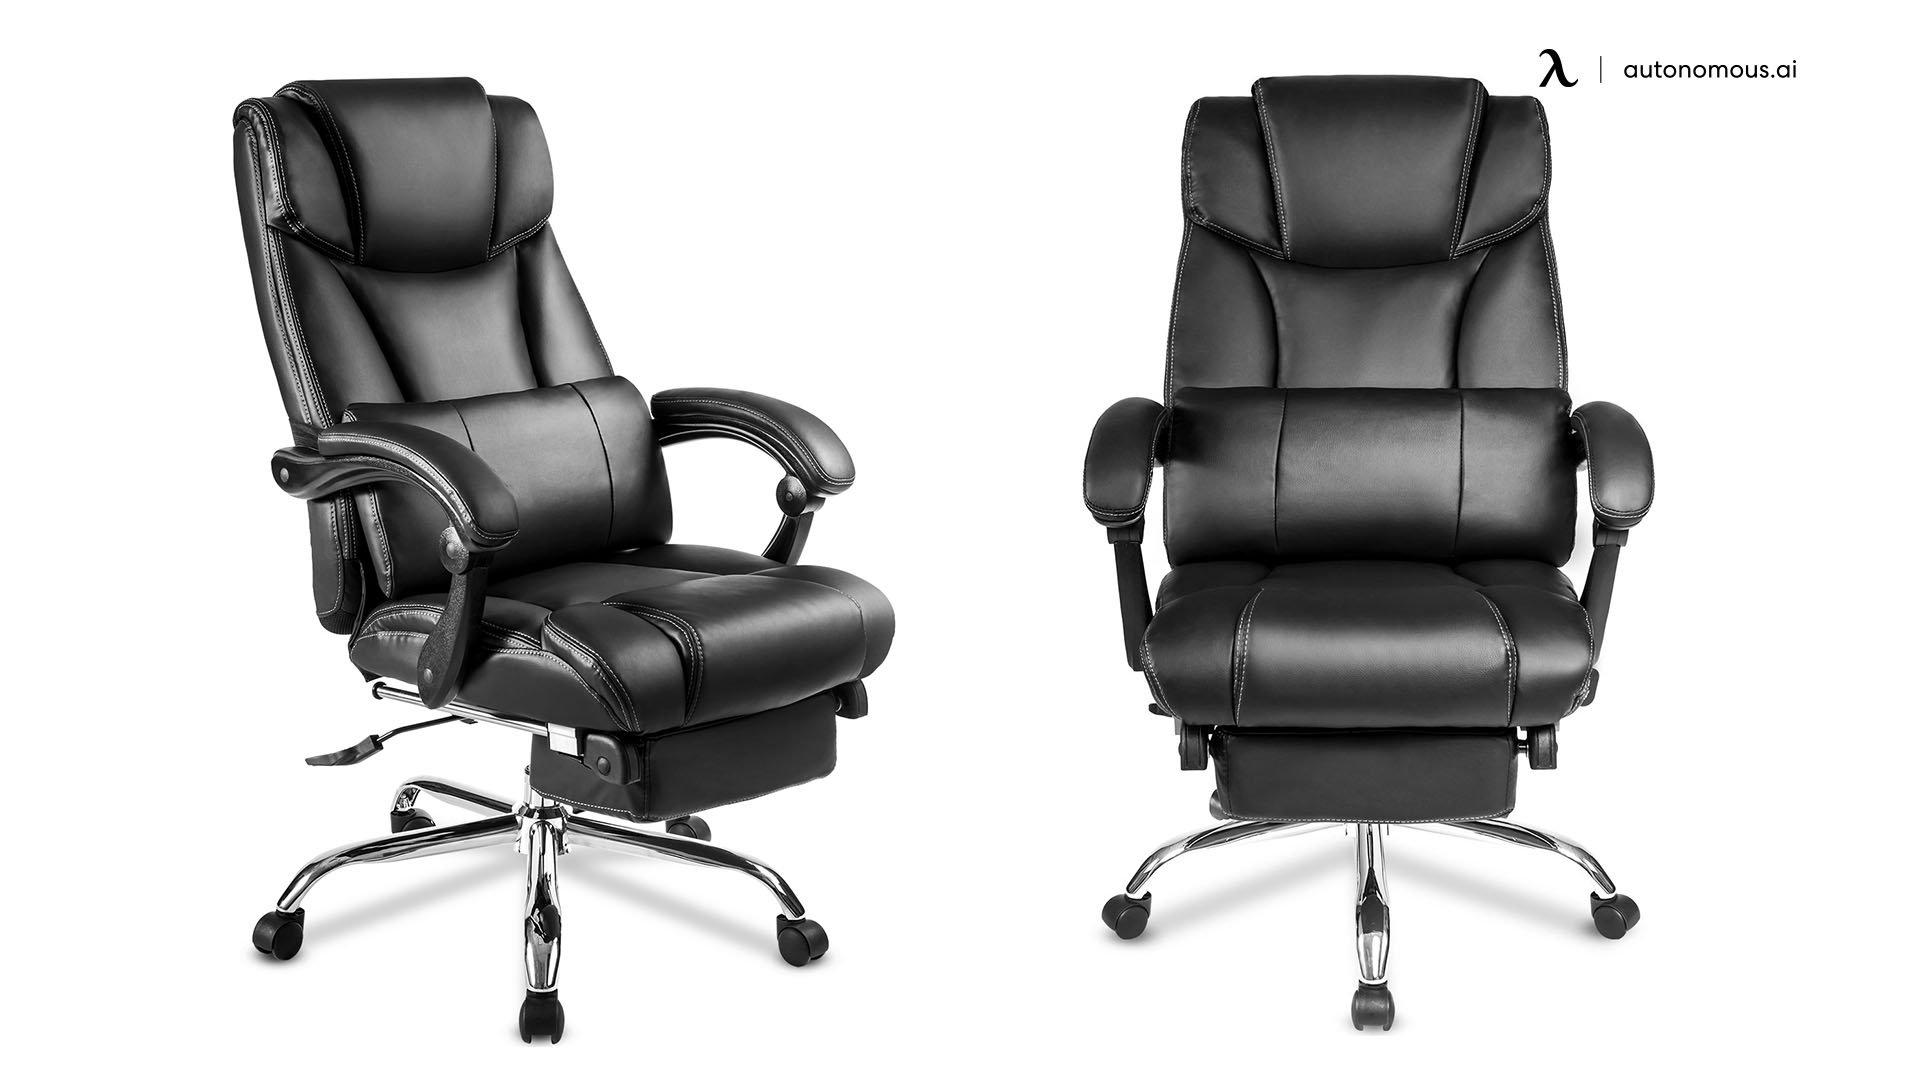 Merax Big and Tall Chair